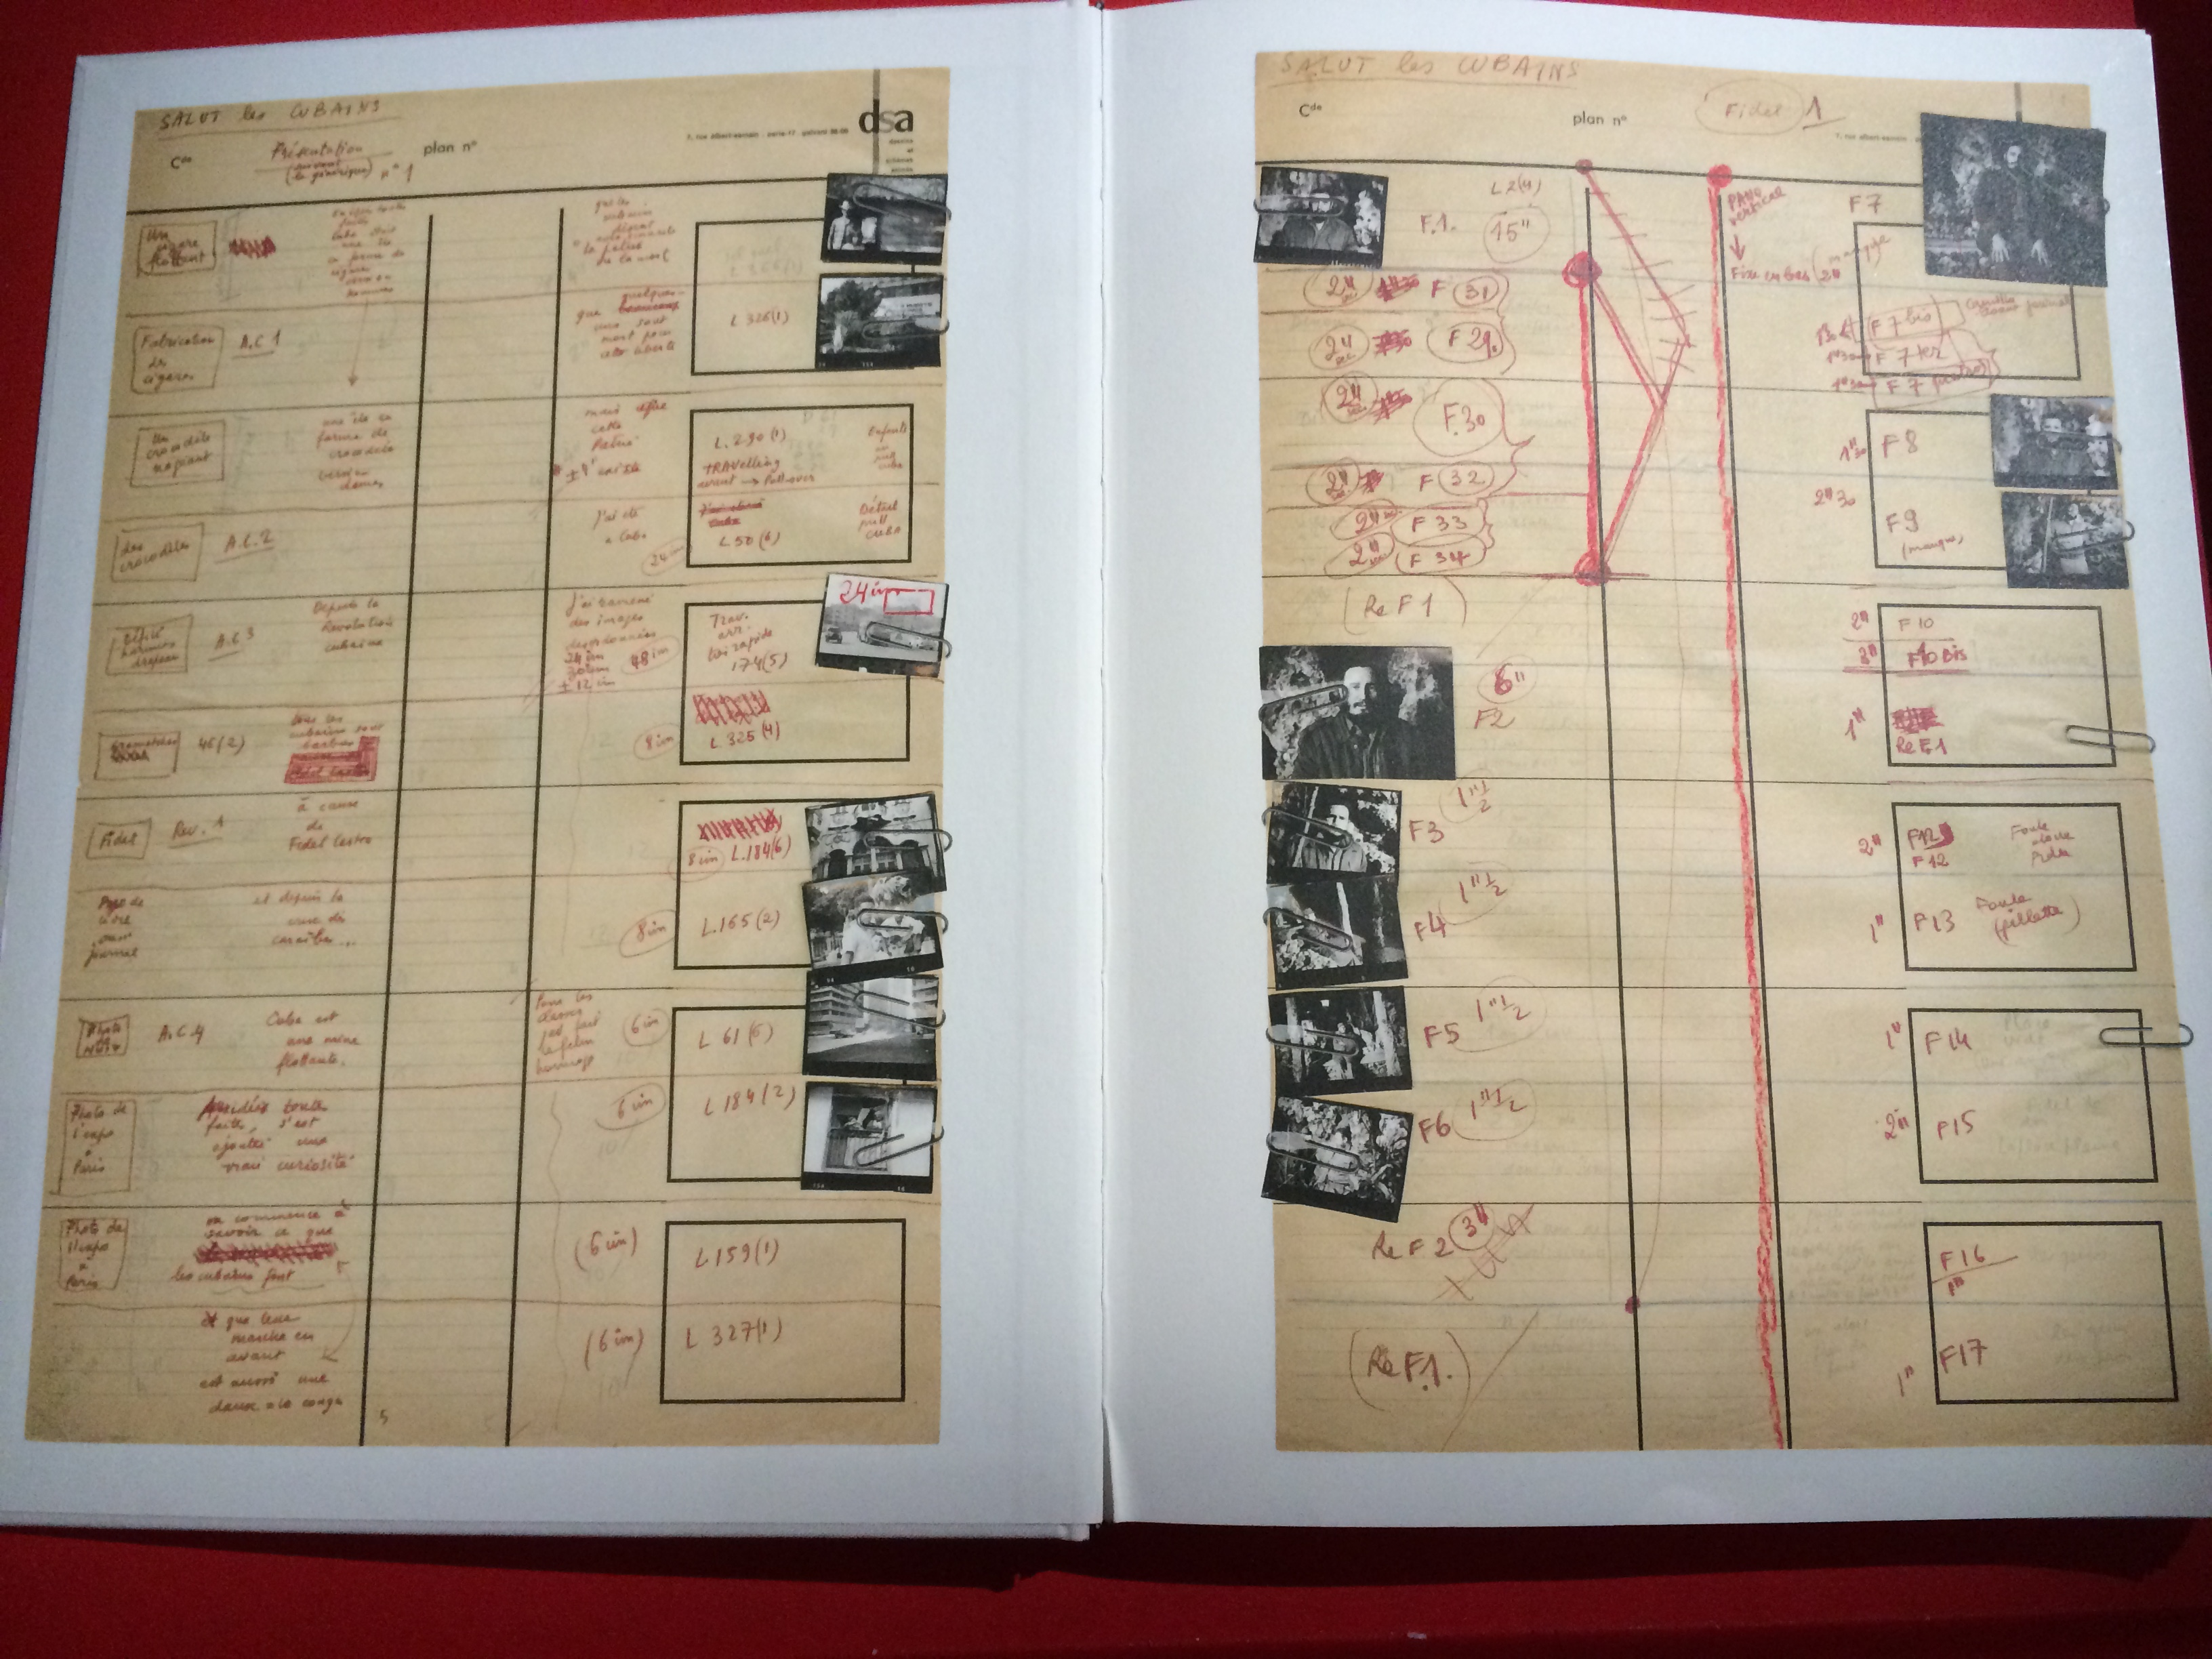 Varda / Cuba , Editions du Centre Pompidou, Editions Xavier Barral, 2015